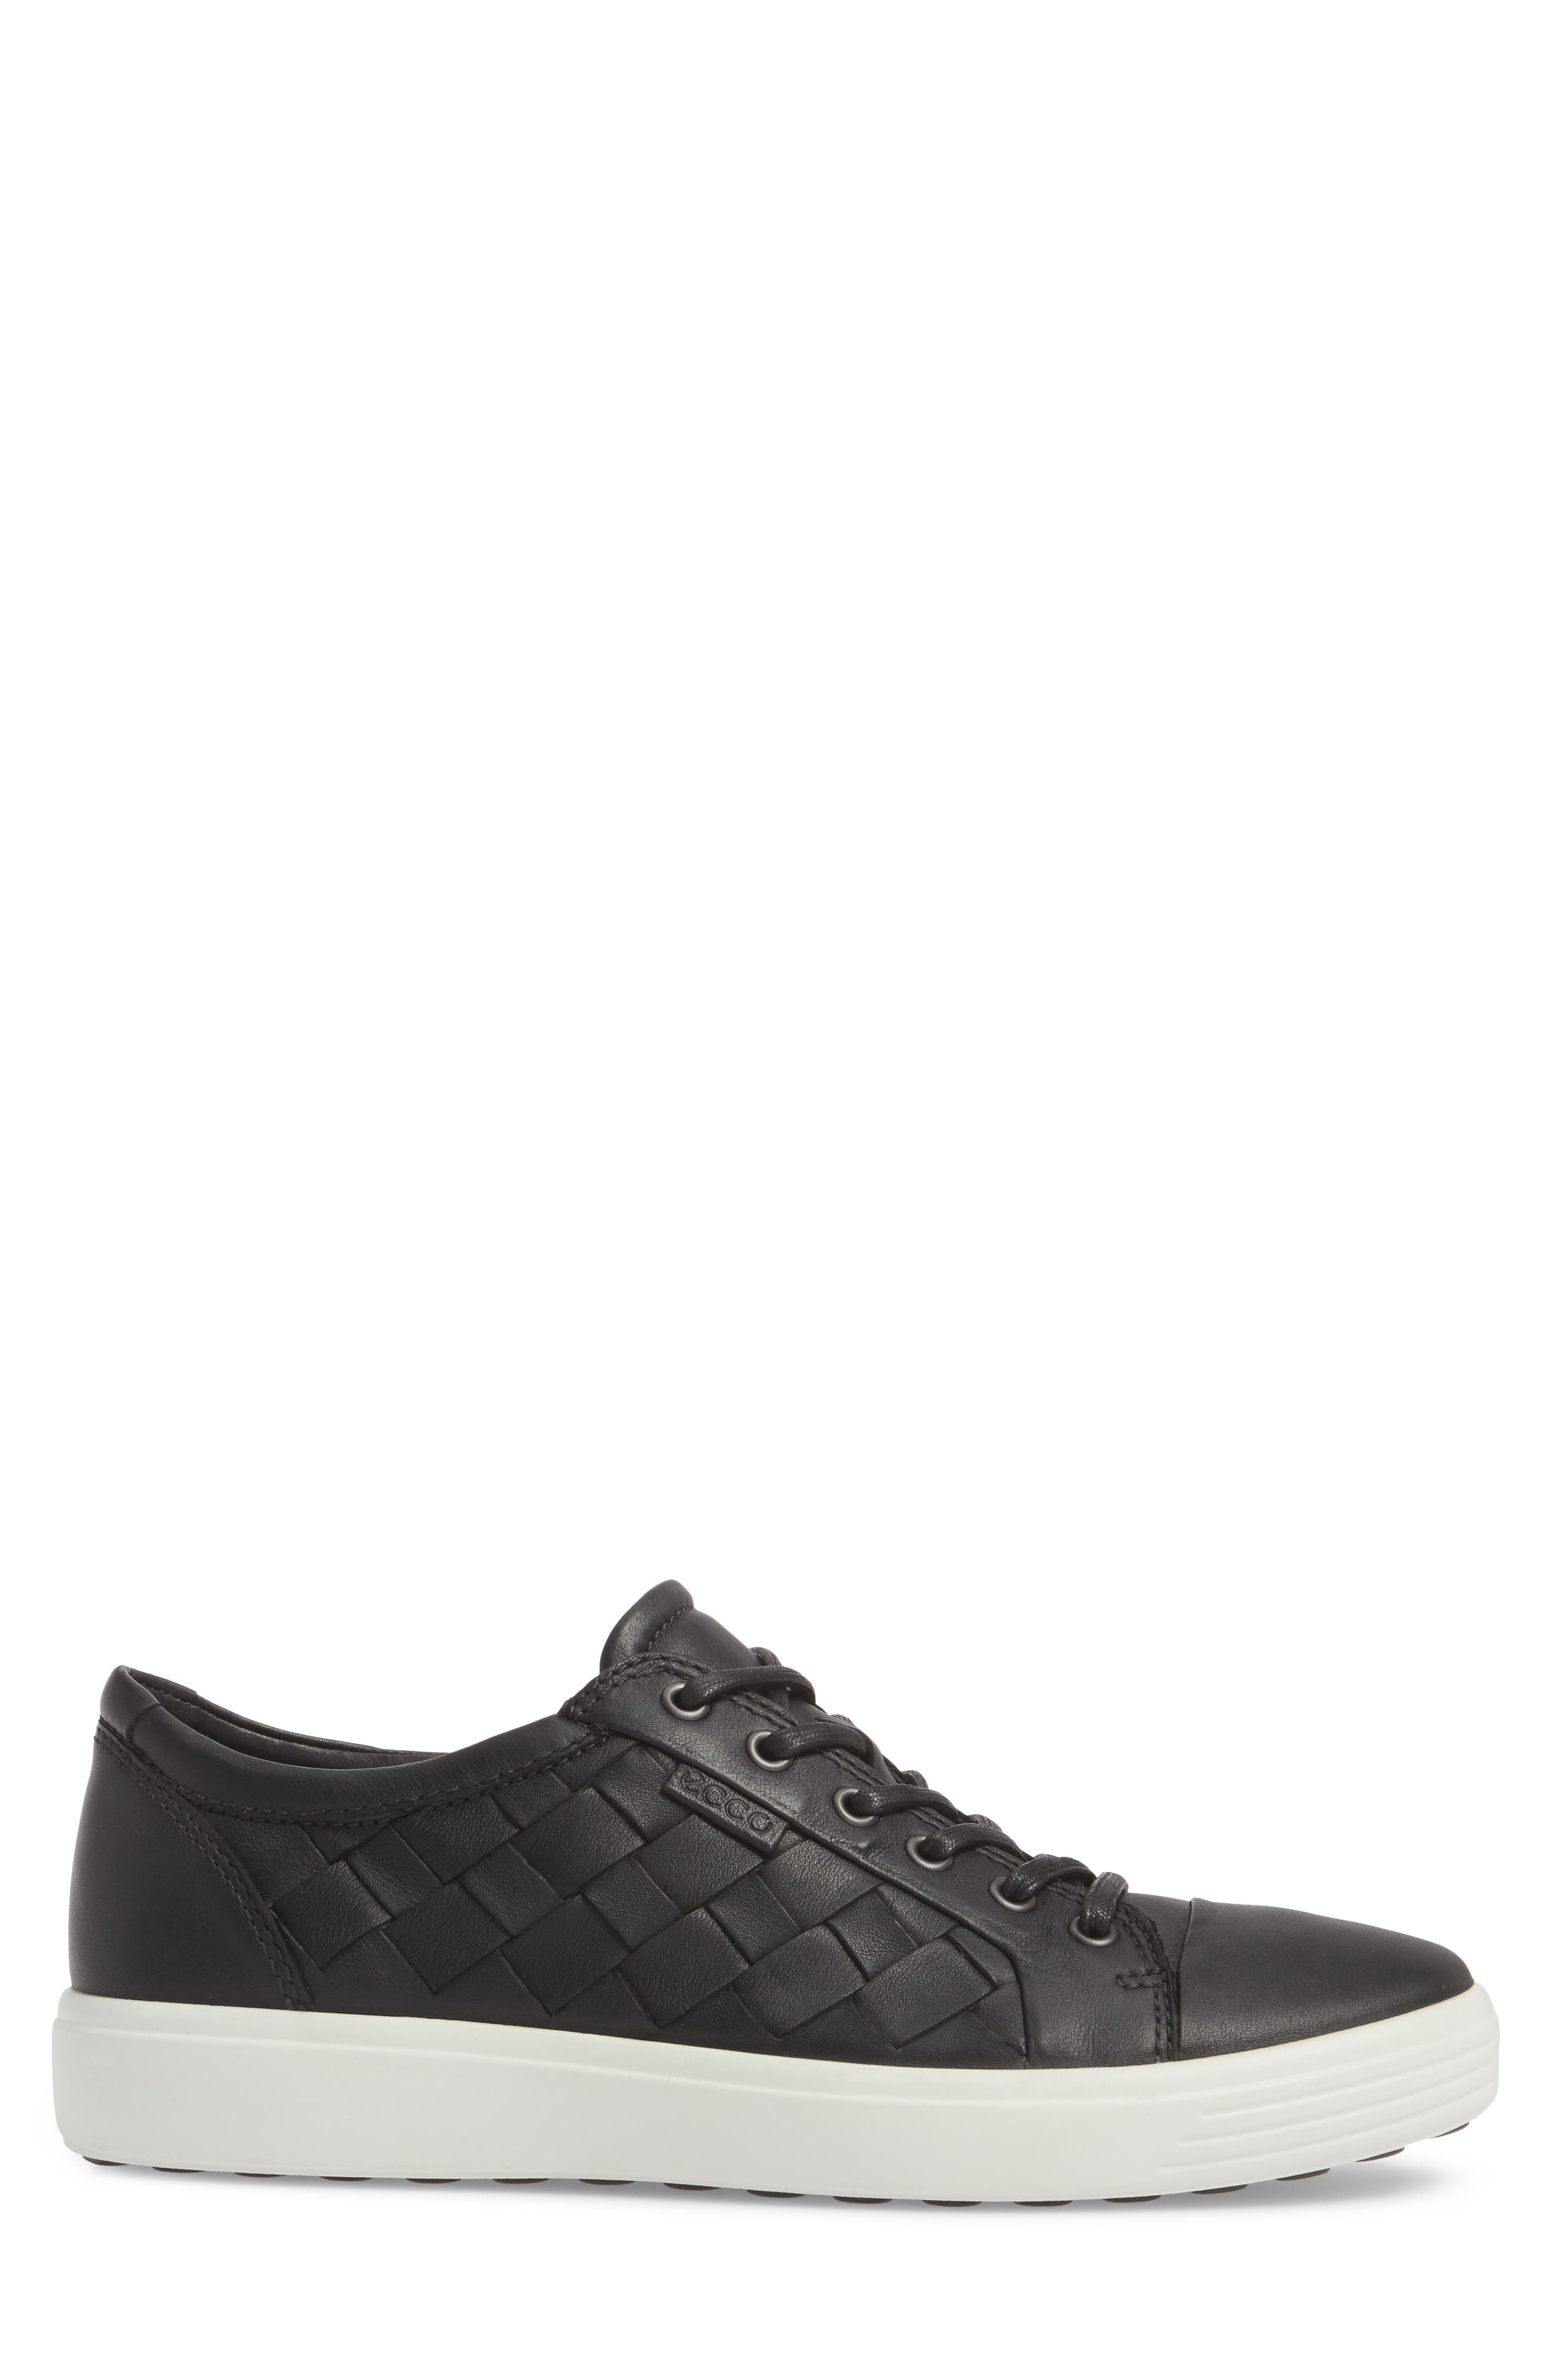 ECCO, Soft 7 Woven Sneaker, Alternate thumbnail 3, color, 009